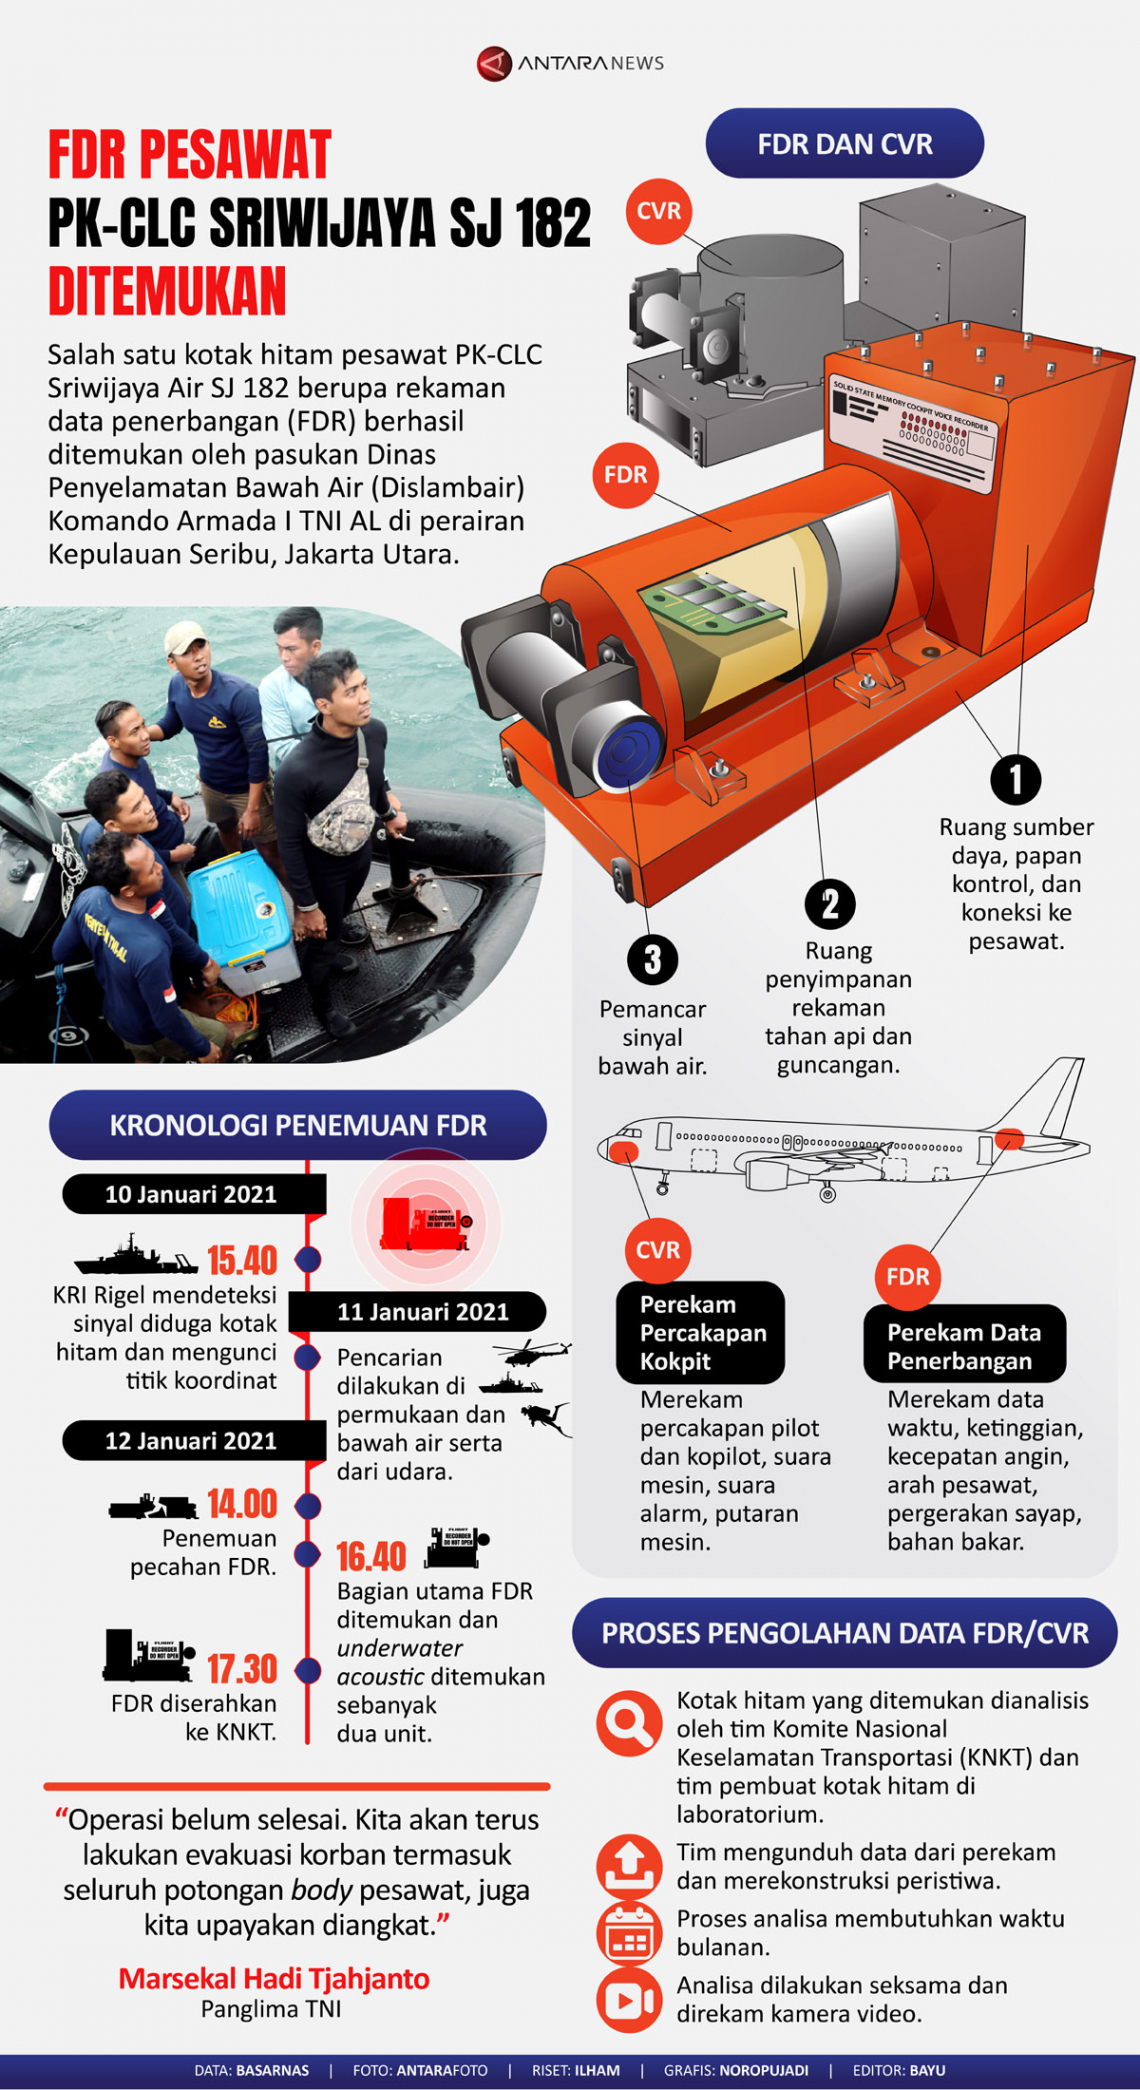 Kotak hitam FDR pesawat PK-CLC Sriwijaya SJ 182 ditemukan